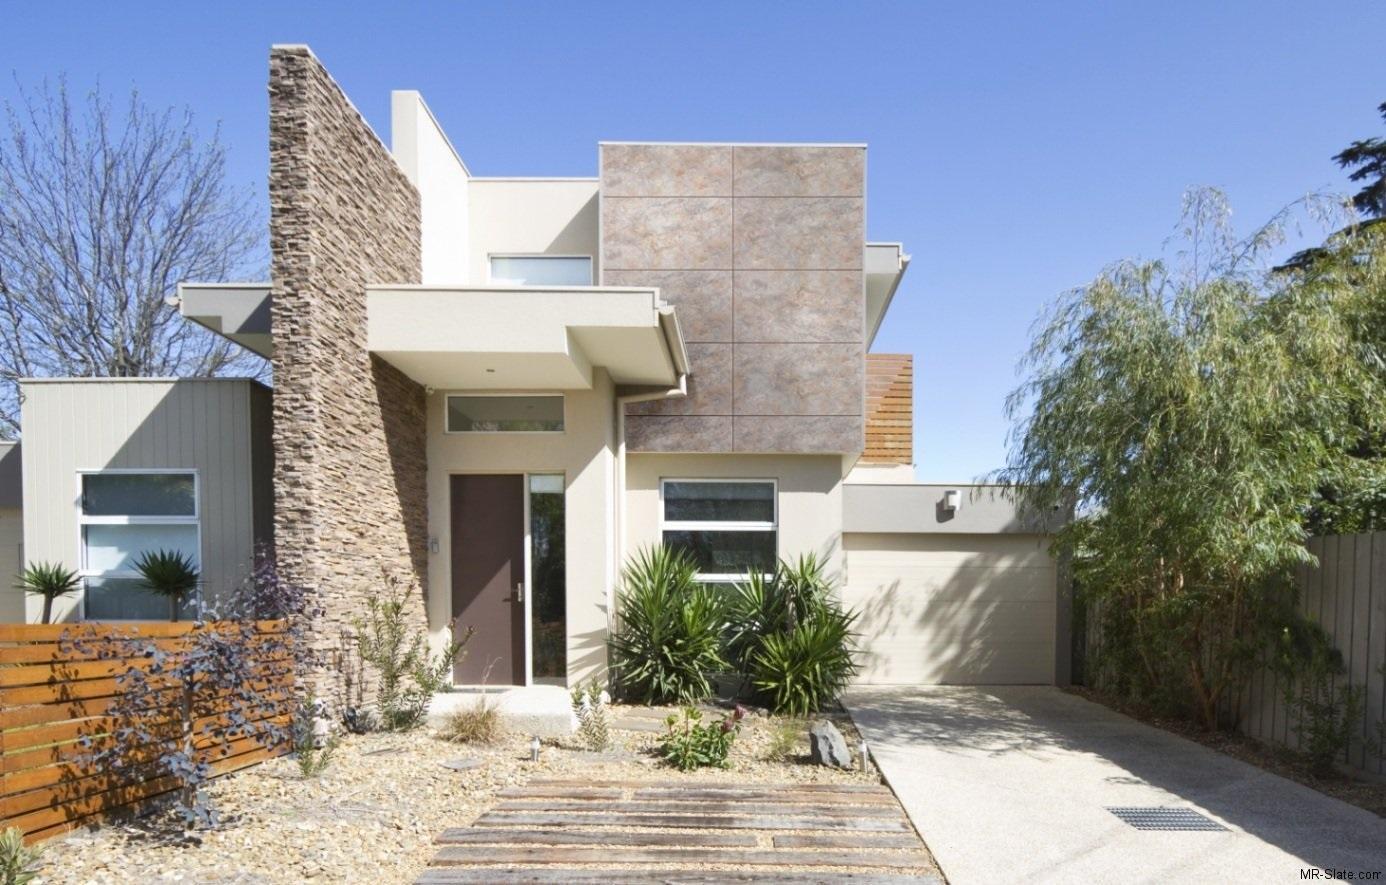 60 modelos de muros residenciais fachadas fotos e dicas - Muro exterior casa ...